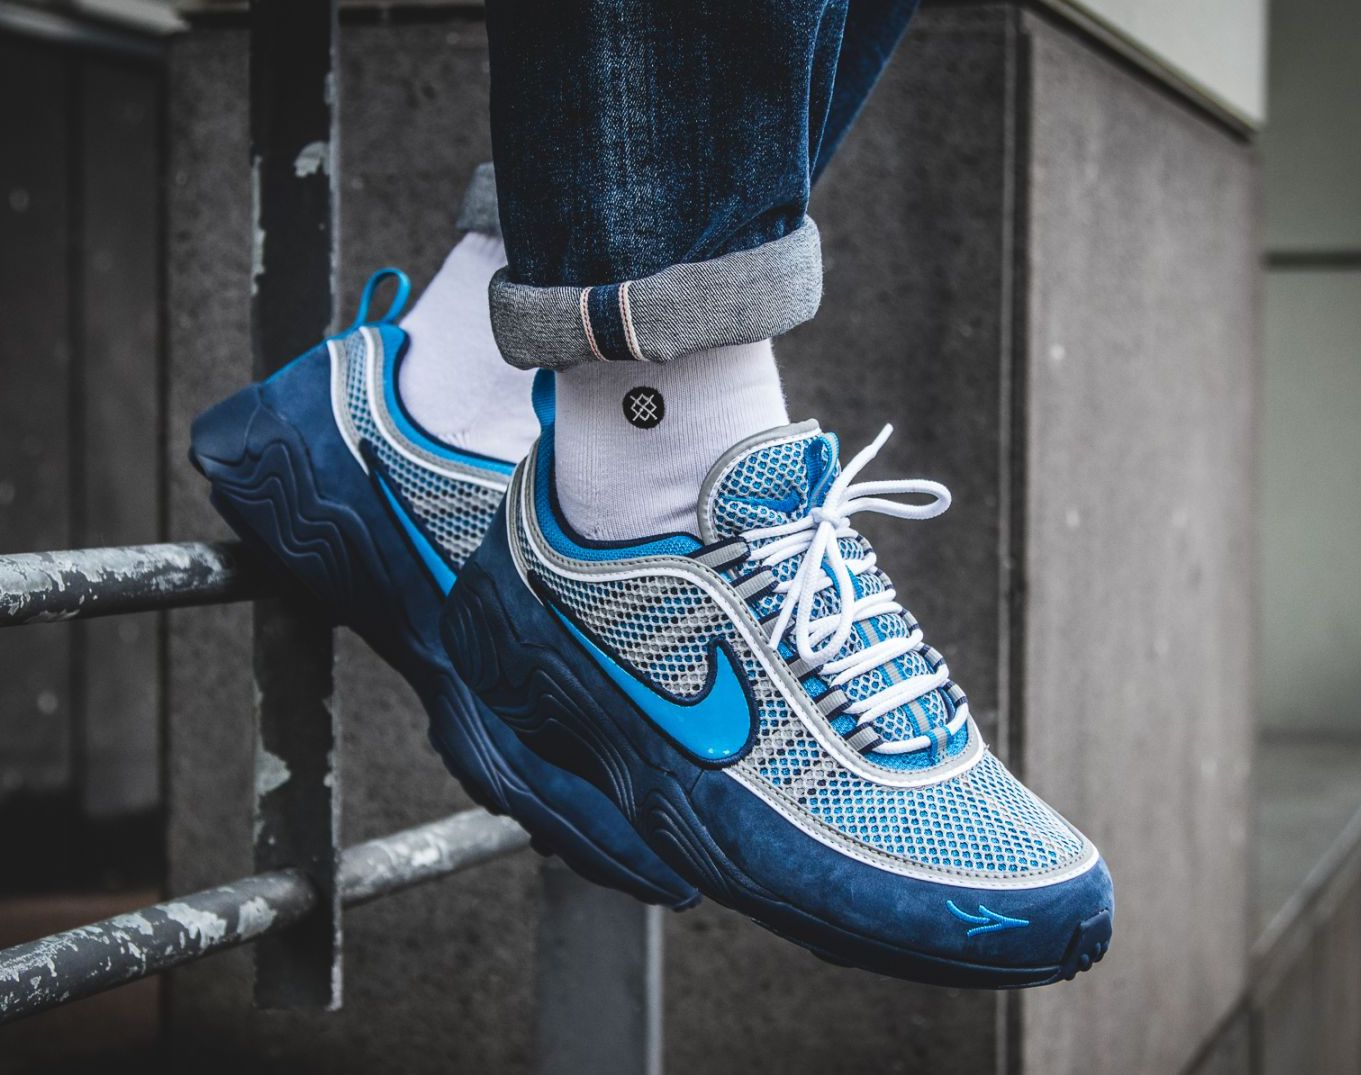 ramasser aa068 73987 On Sale: Stash x NikeLab Air Zoom Spiridon '16 — Sneaker Shouts